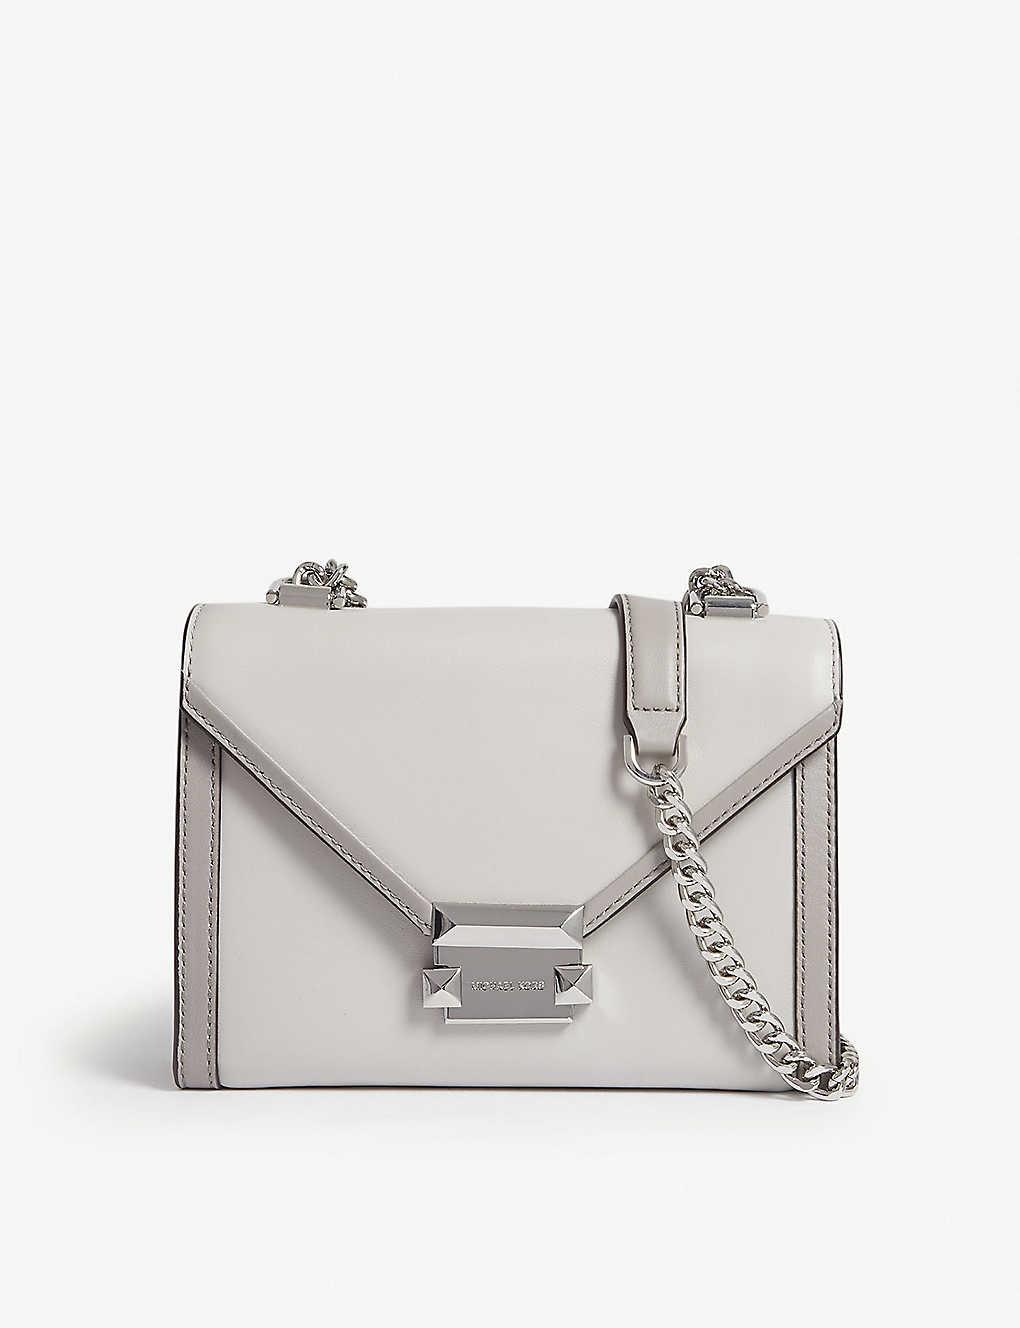 04e8ab6ab299 MICHAEL MICHAEL KORS - Whitney small leather shoulder bag ...